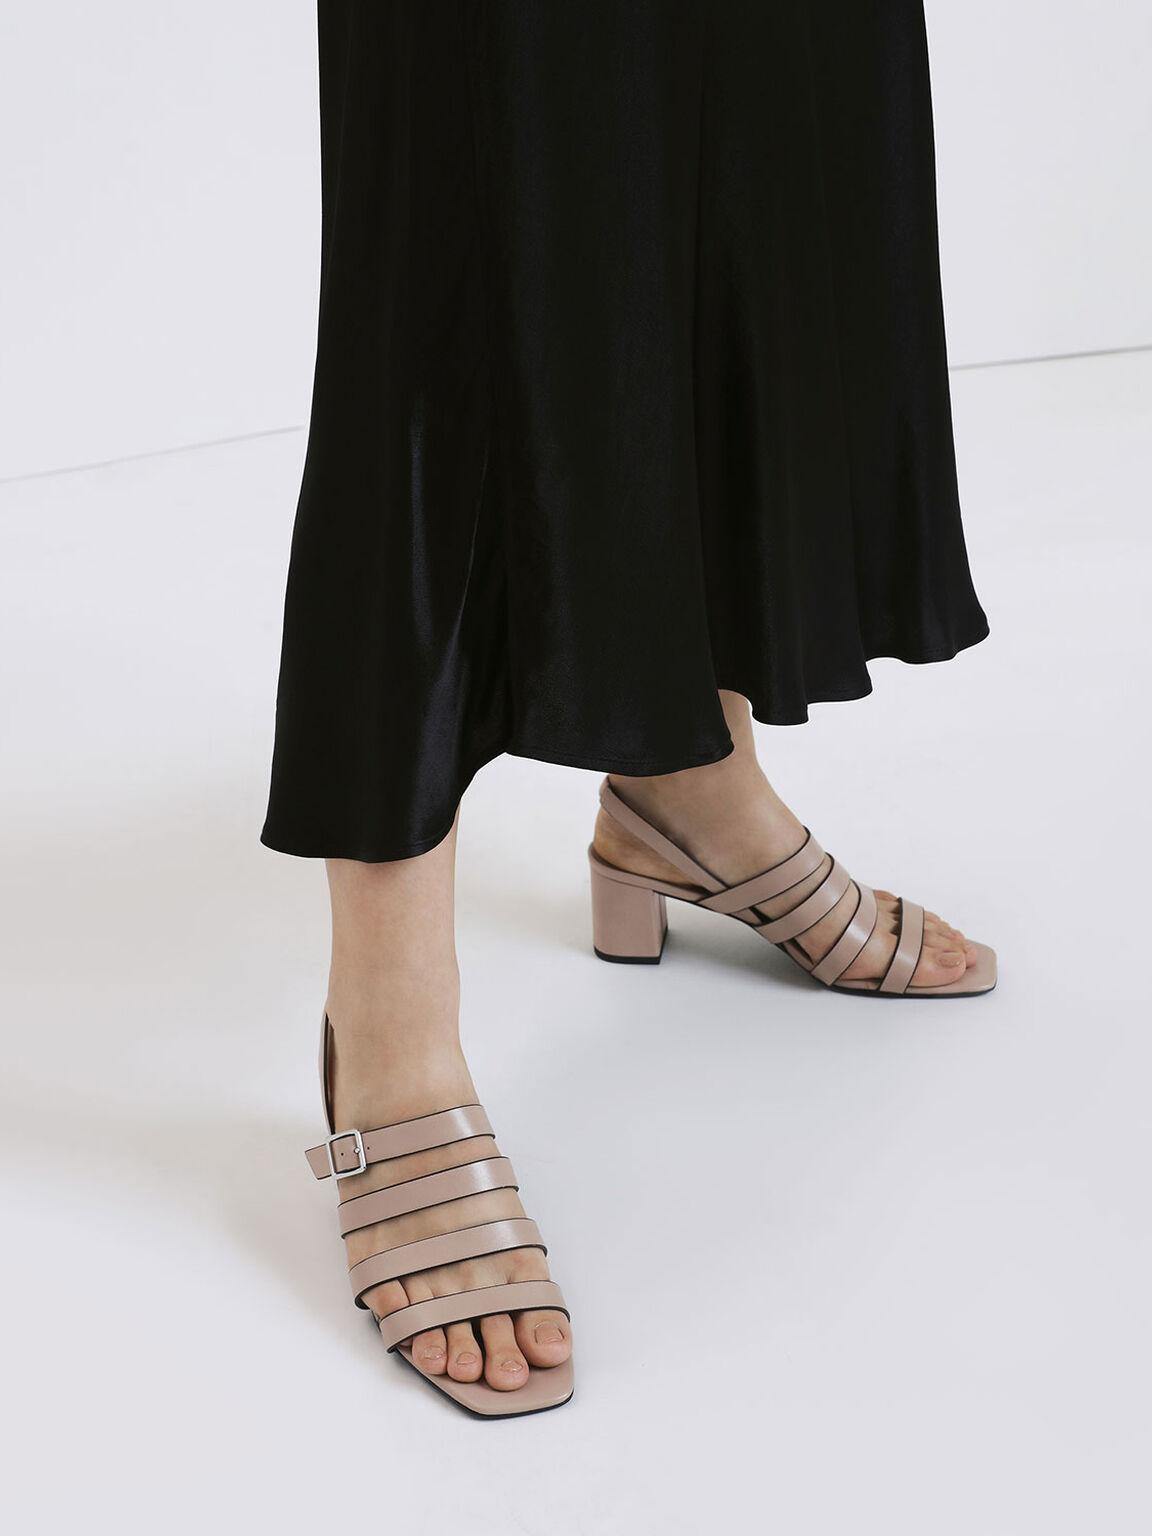 Strappy Block Heel Slingback Sandals, Nude, hi-res